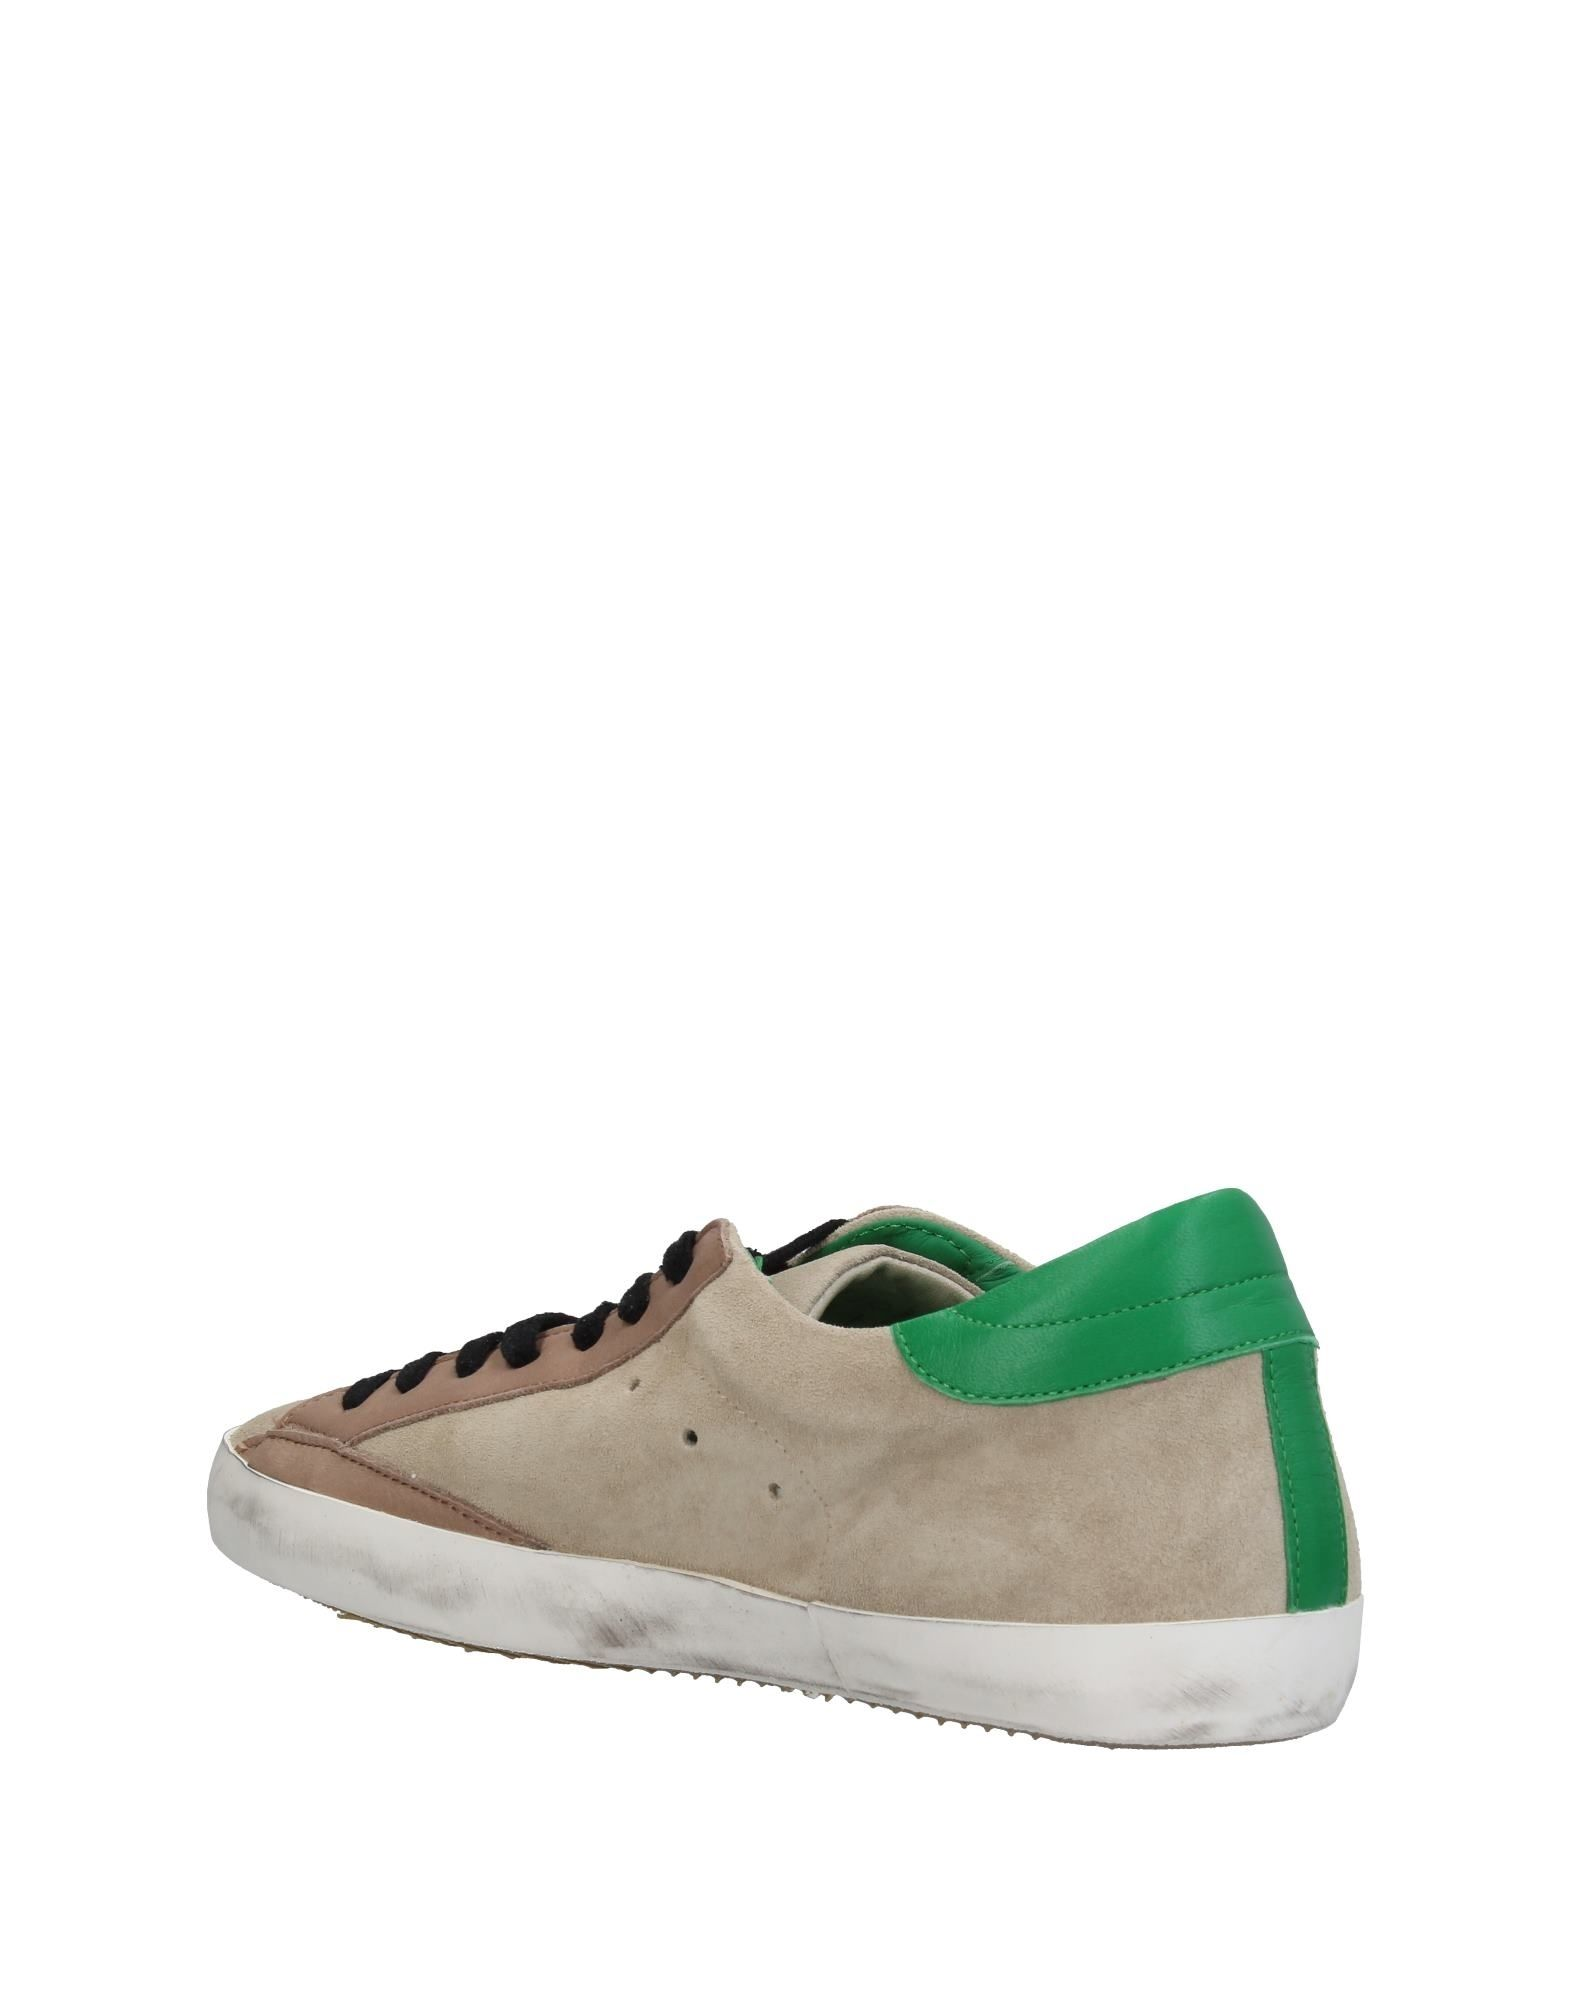 Philippe Model Sneakers Herren    11386452DI Neue Schuhe 1aa428